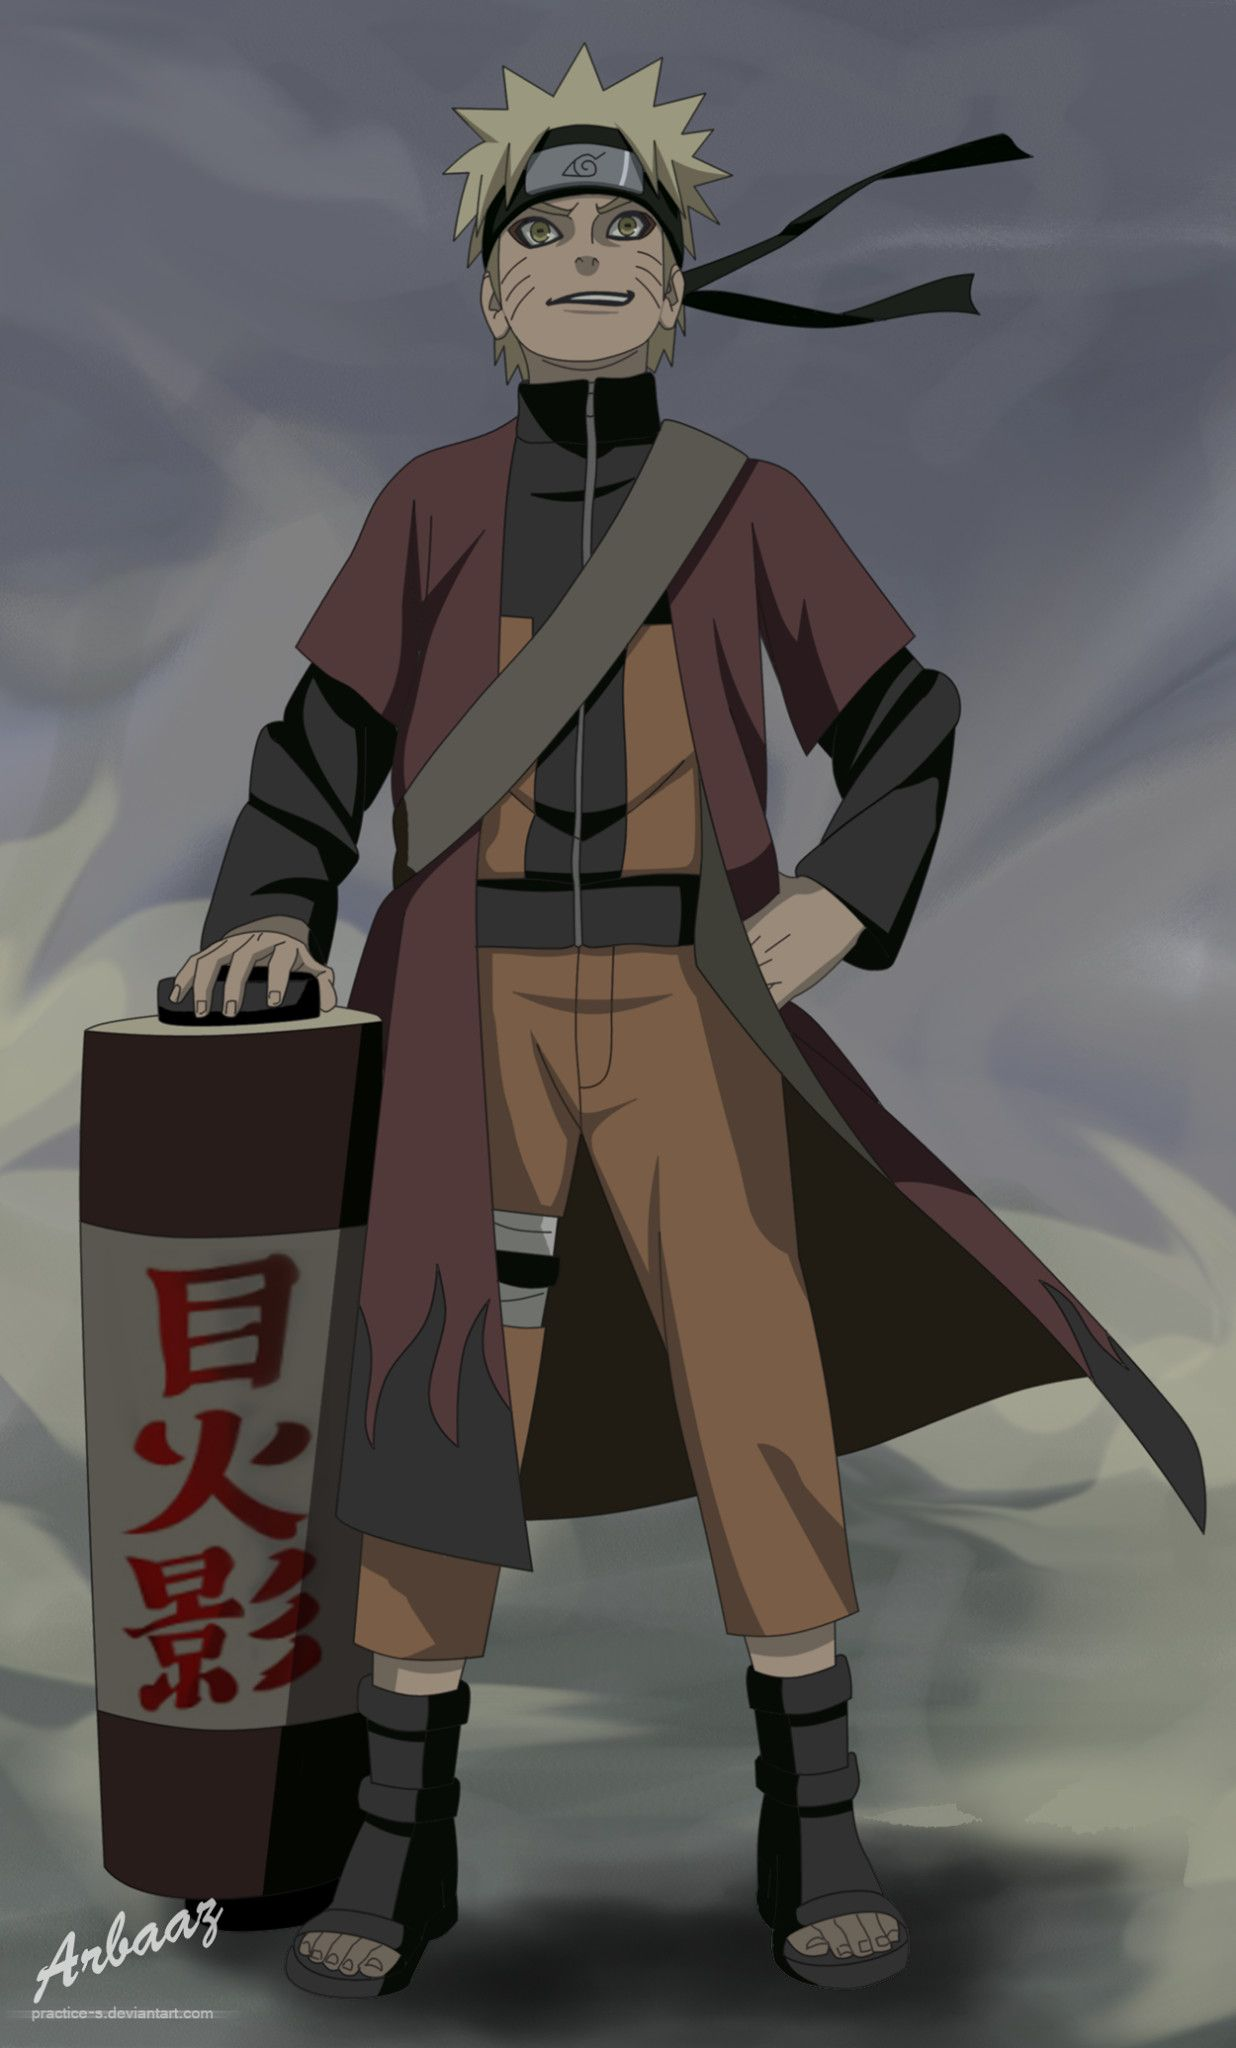 Naruto Anime Iphone X Wallpaper Andriblog001 In 2020 Naruto Shippuden Anime Naruto Shippuden Sasuke Naruto Uzumaki